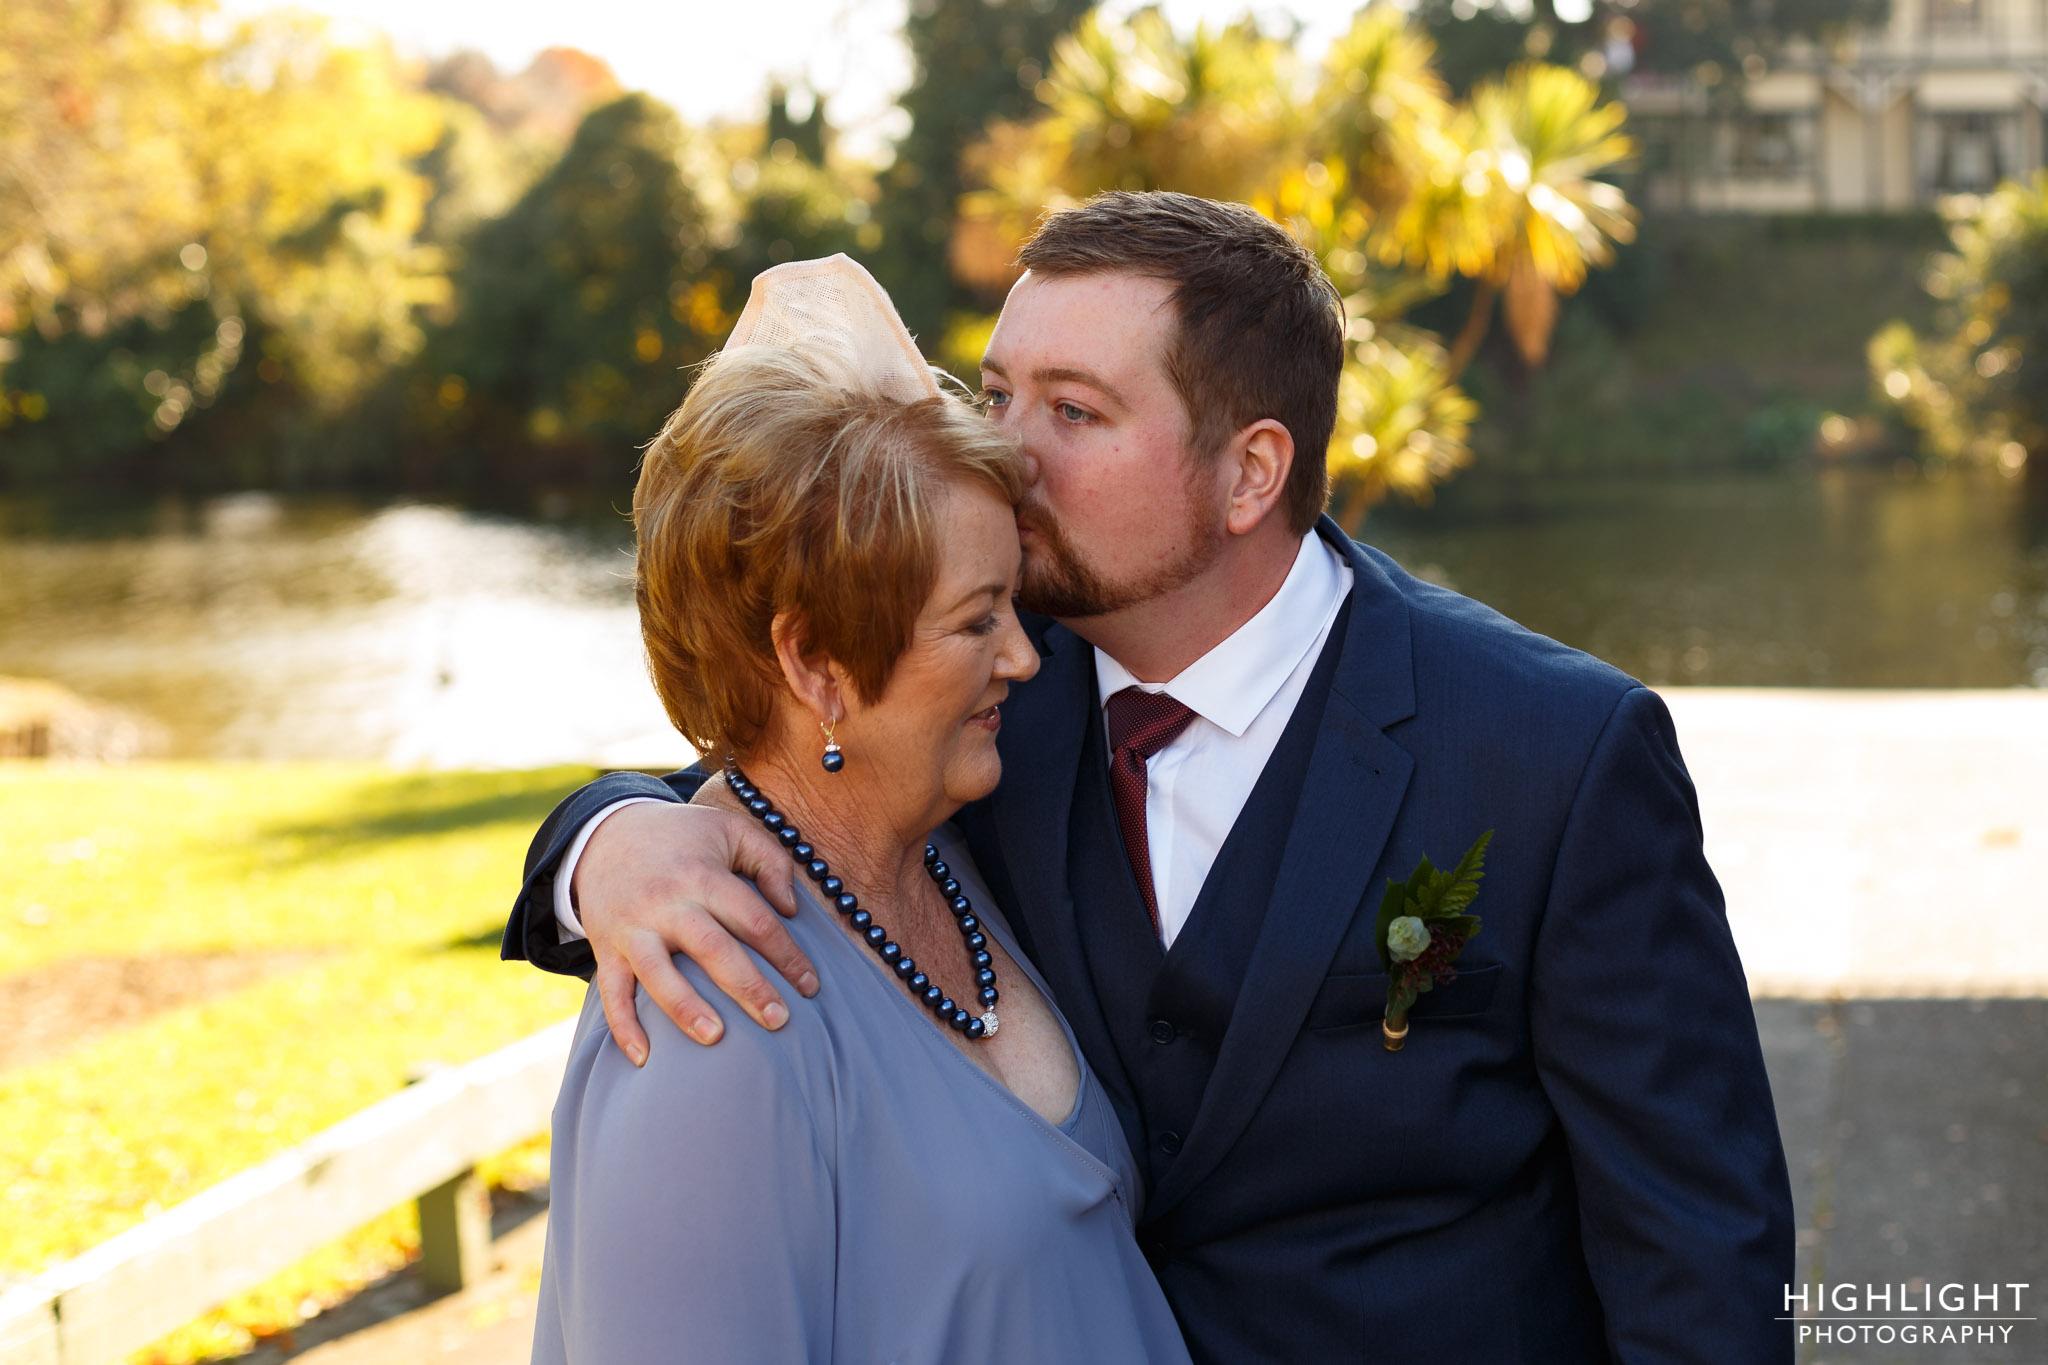 Highlight-wedding-photography-new-zealand-palmerston-north-21.jpg